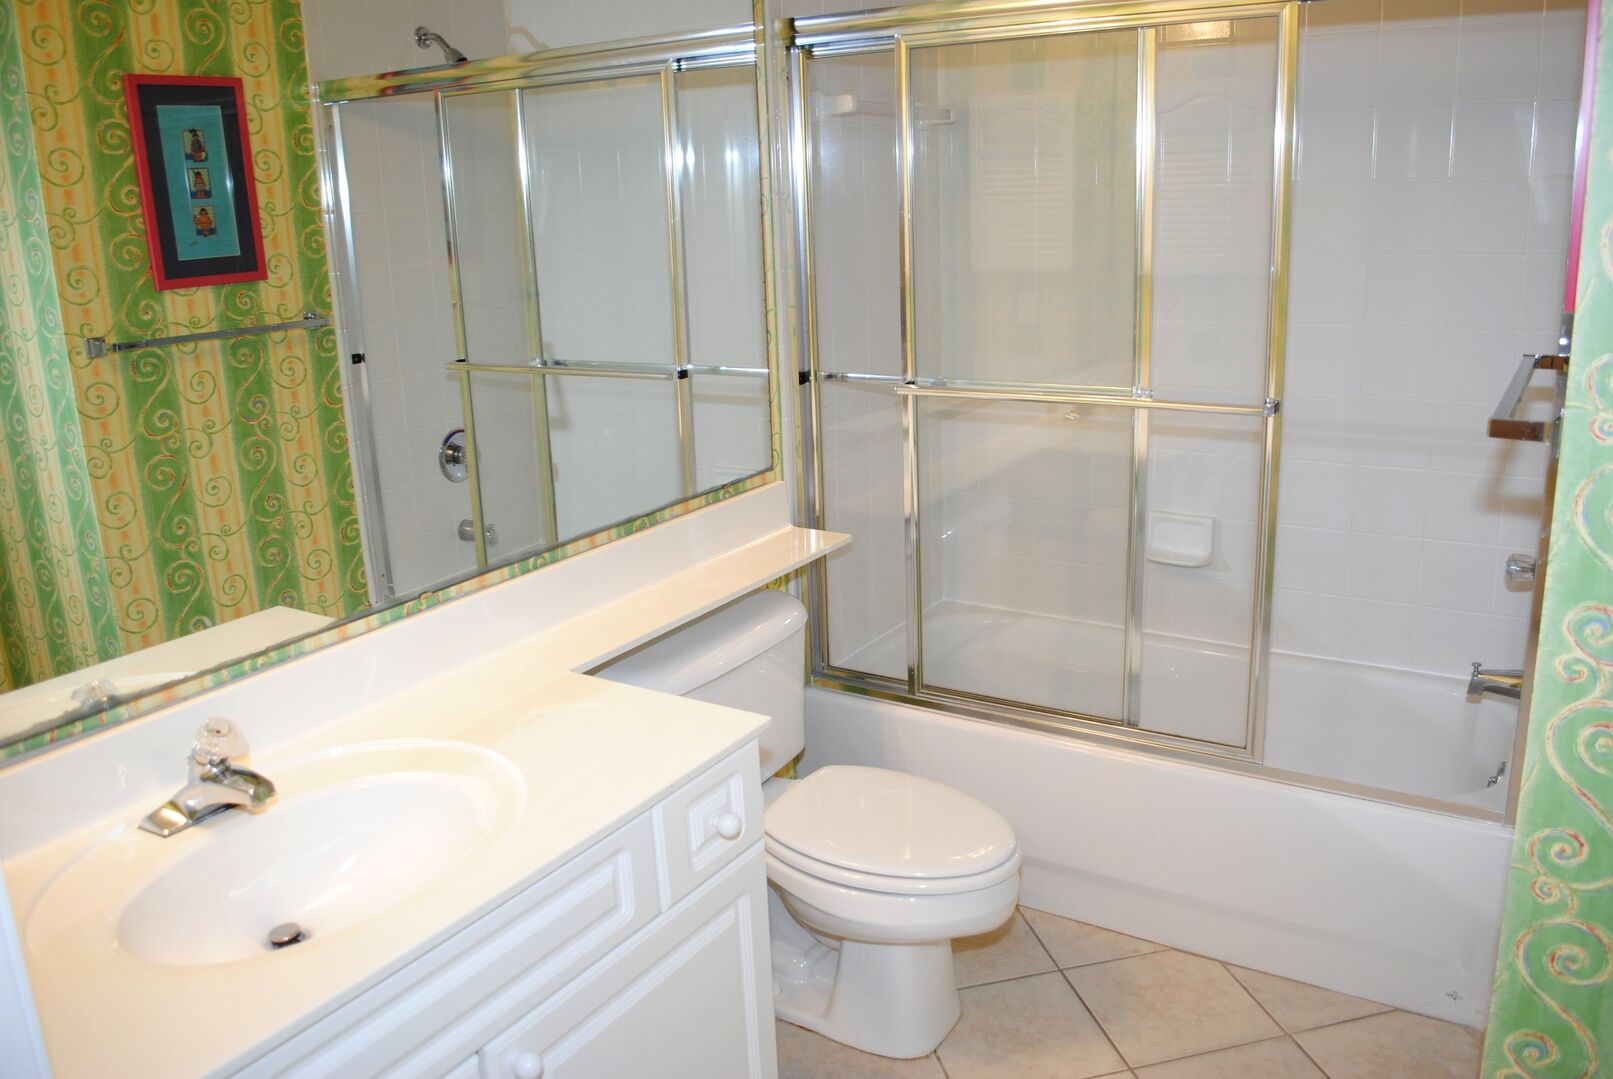 Shared Bathroom (Queen and Hallway